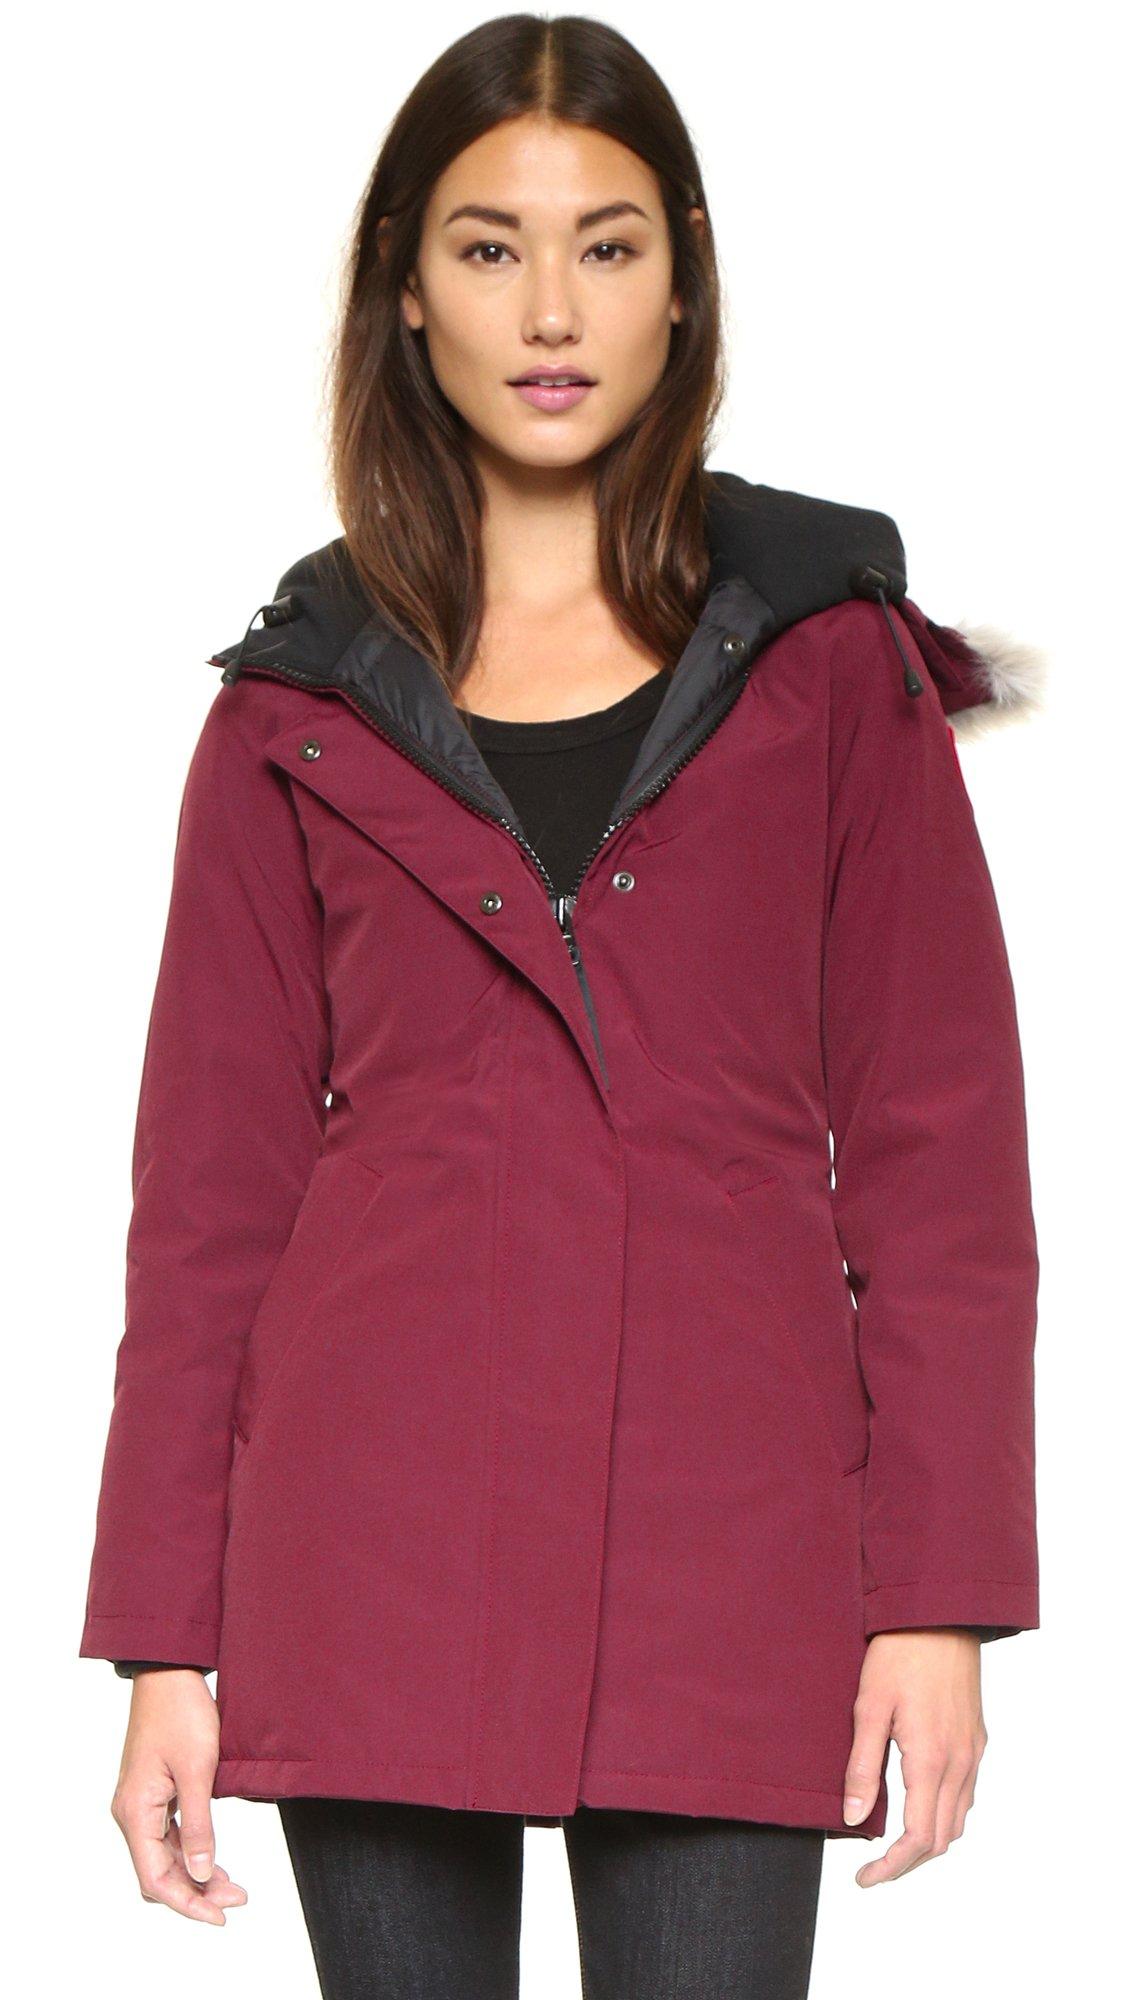 canada goose jackets in victoria bc